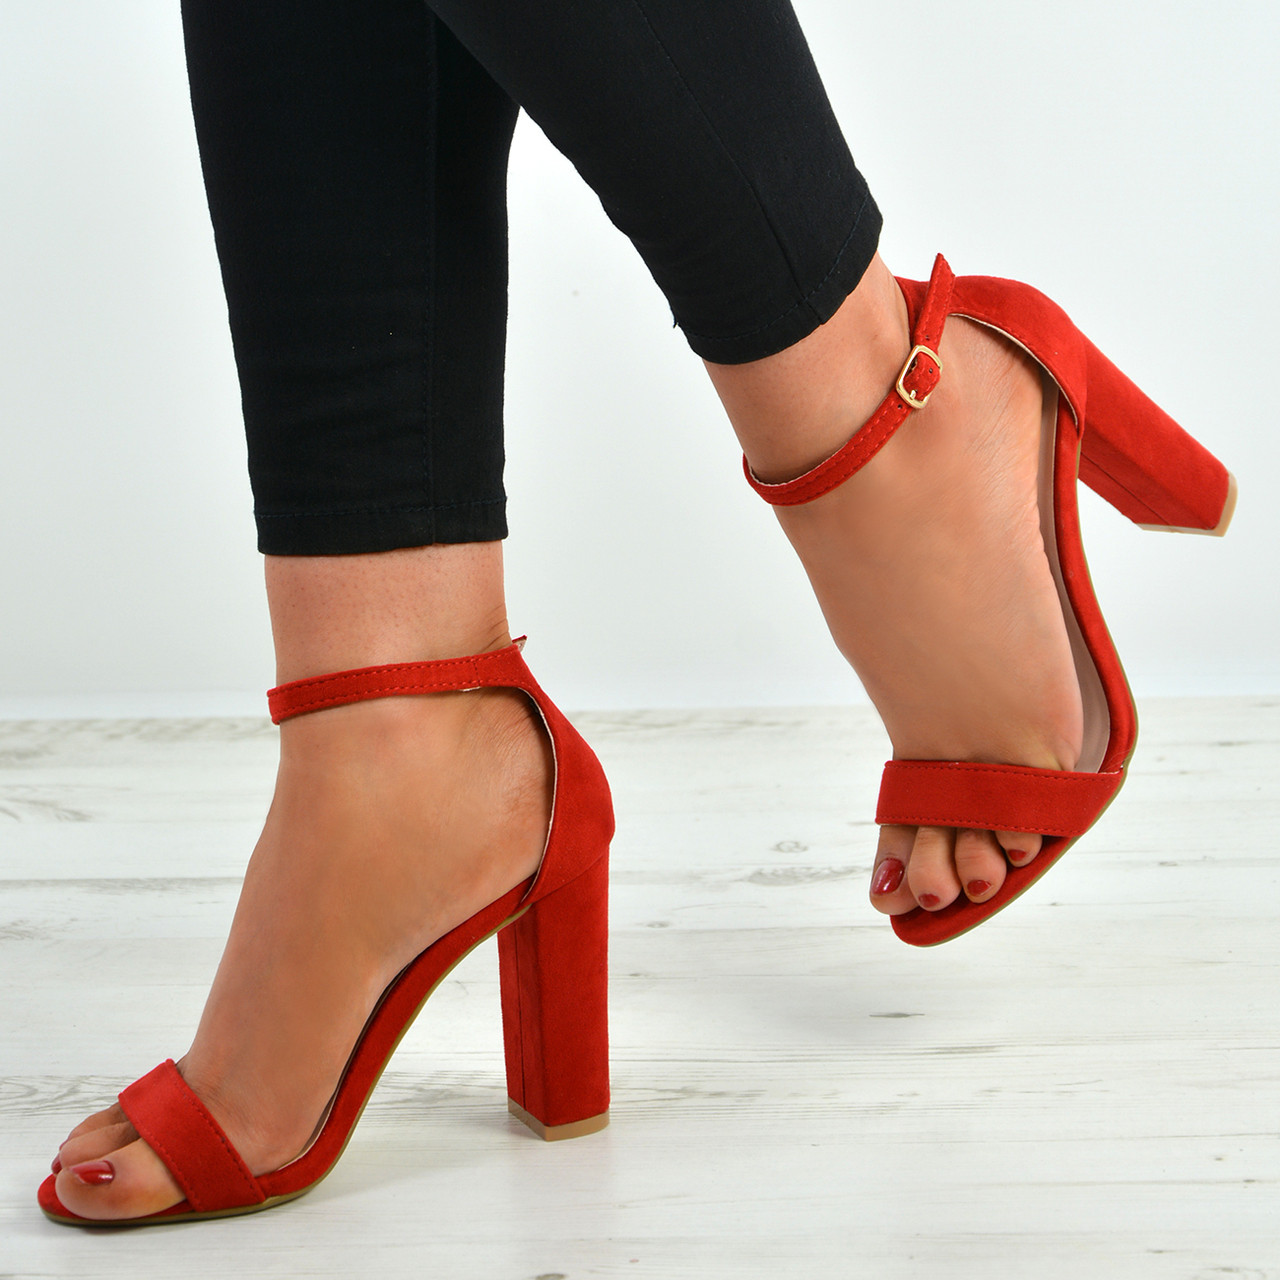 1e9fb2db026 New Womens Ankle Strap Block Heel Sandals Peep Toe Ladies Shoes Size Uk 3-8